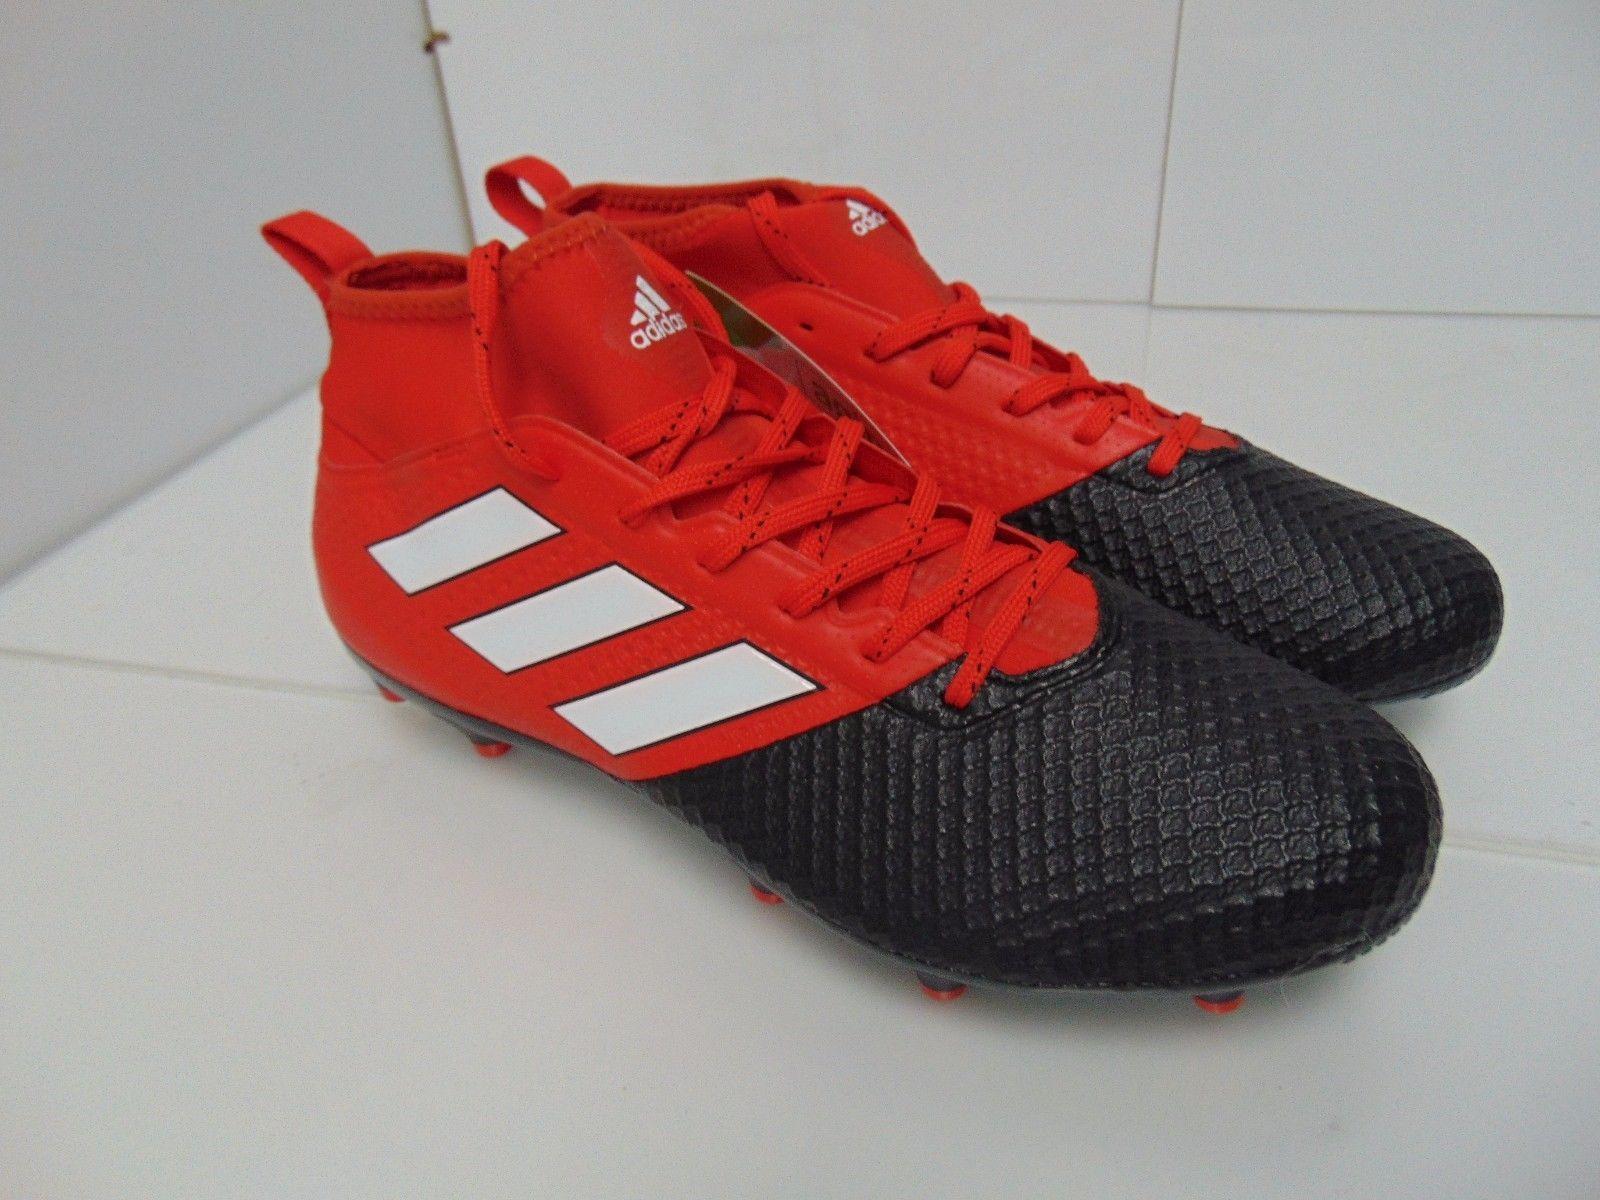 super popular 3584c 4fd6f adidas Ace 17.3 PrimeMesh FG Soccer Shoes Cleats Football ...